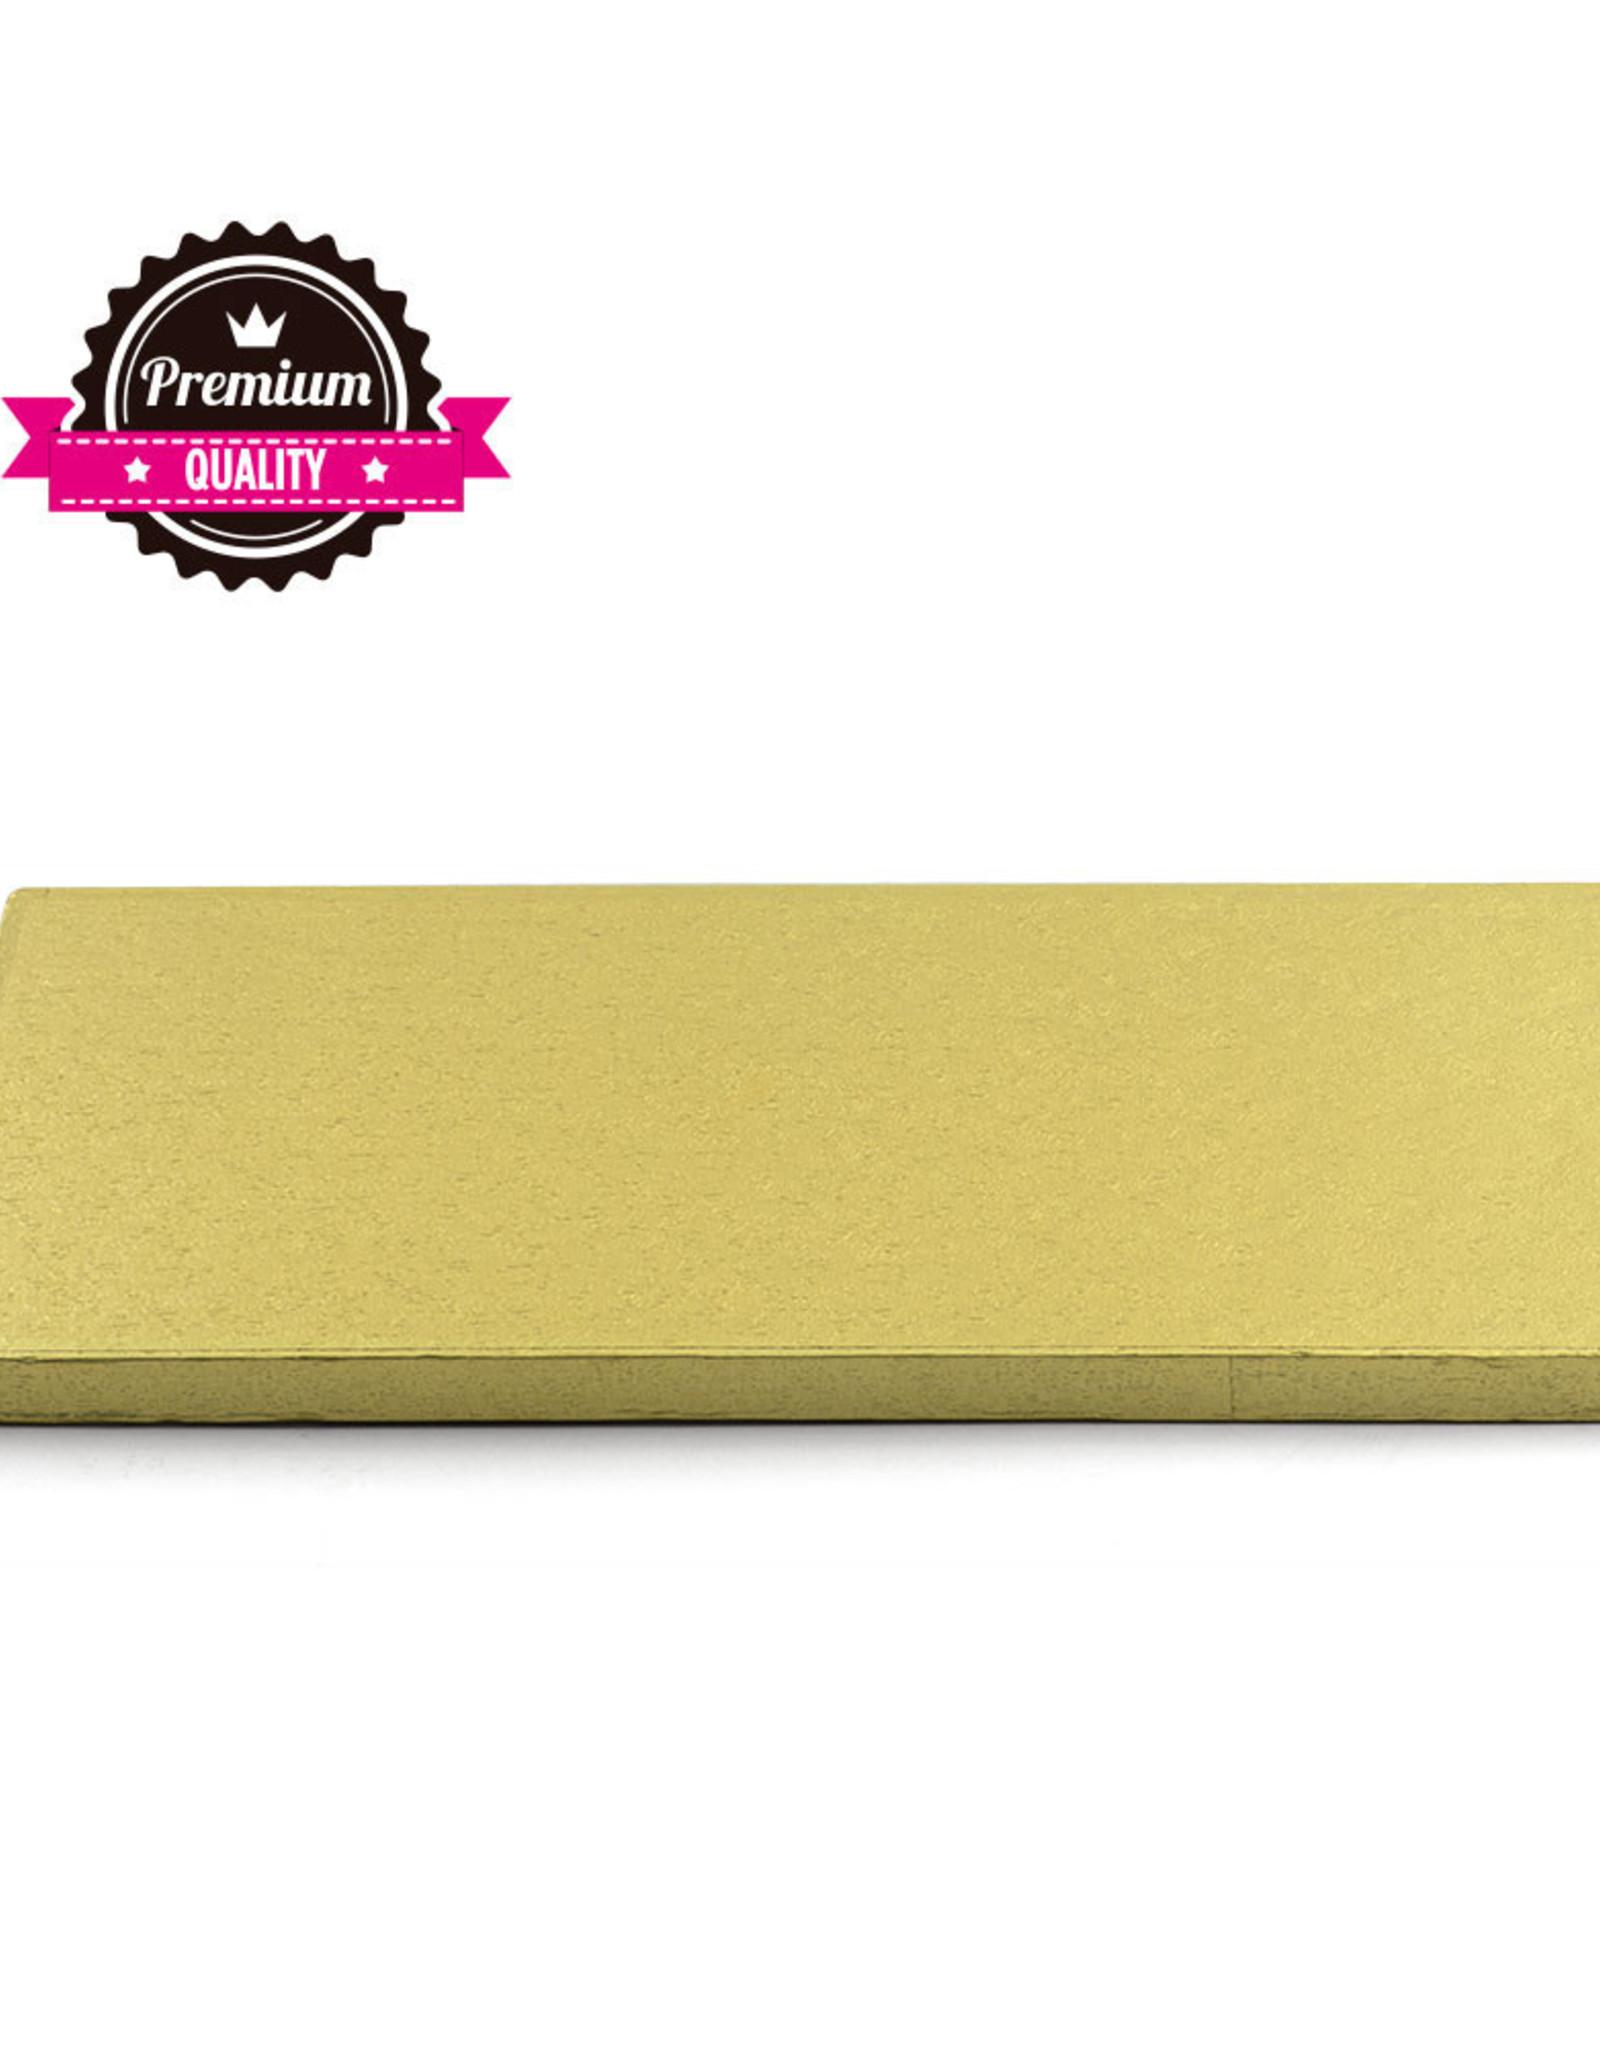 Cake Drum Rechthoek 30x20cm Gold